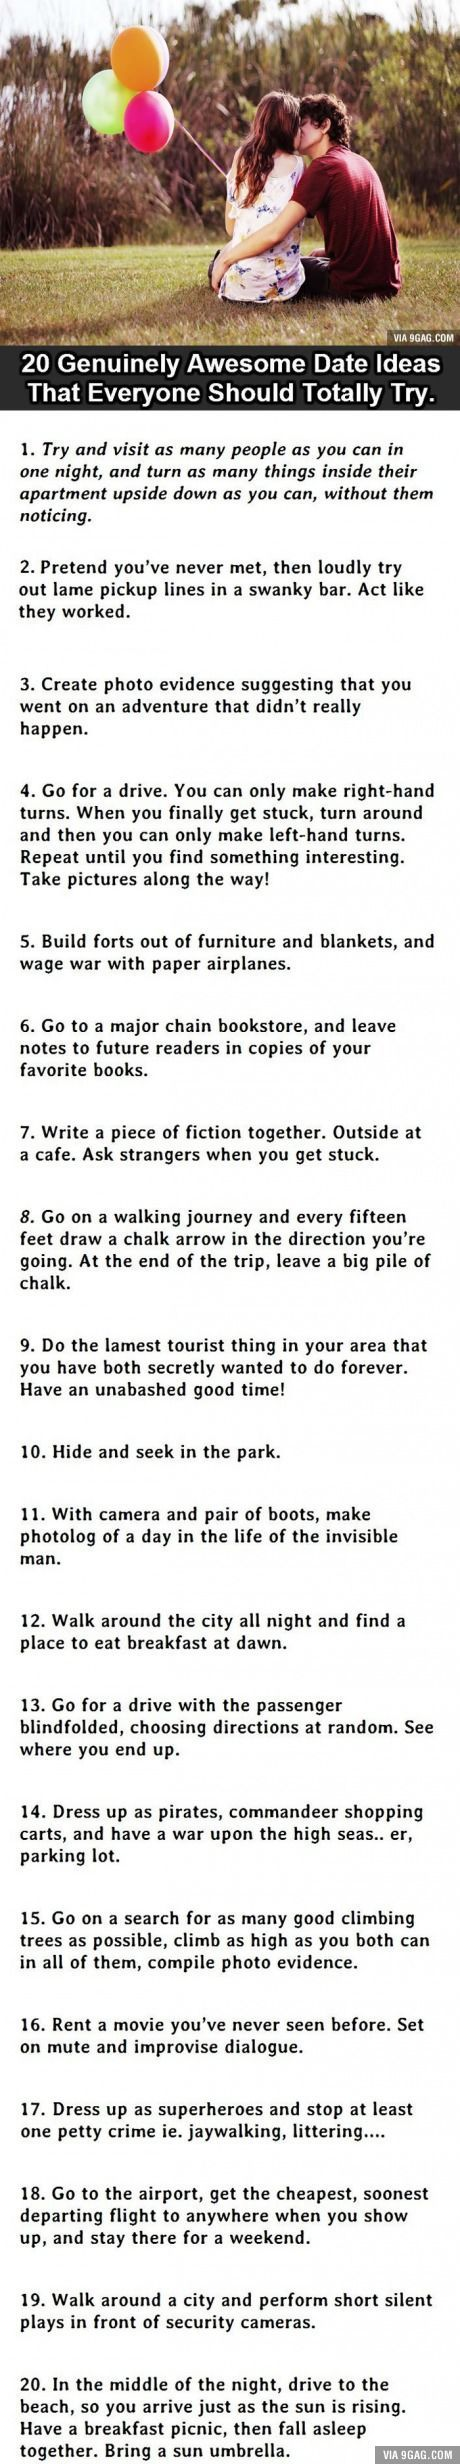 652 best Outdoor Date Ideas images on Pinterest   Romantic ideas, My ...